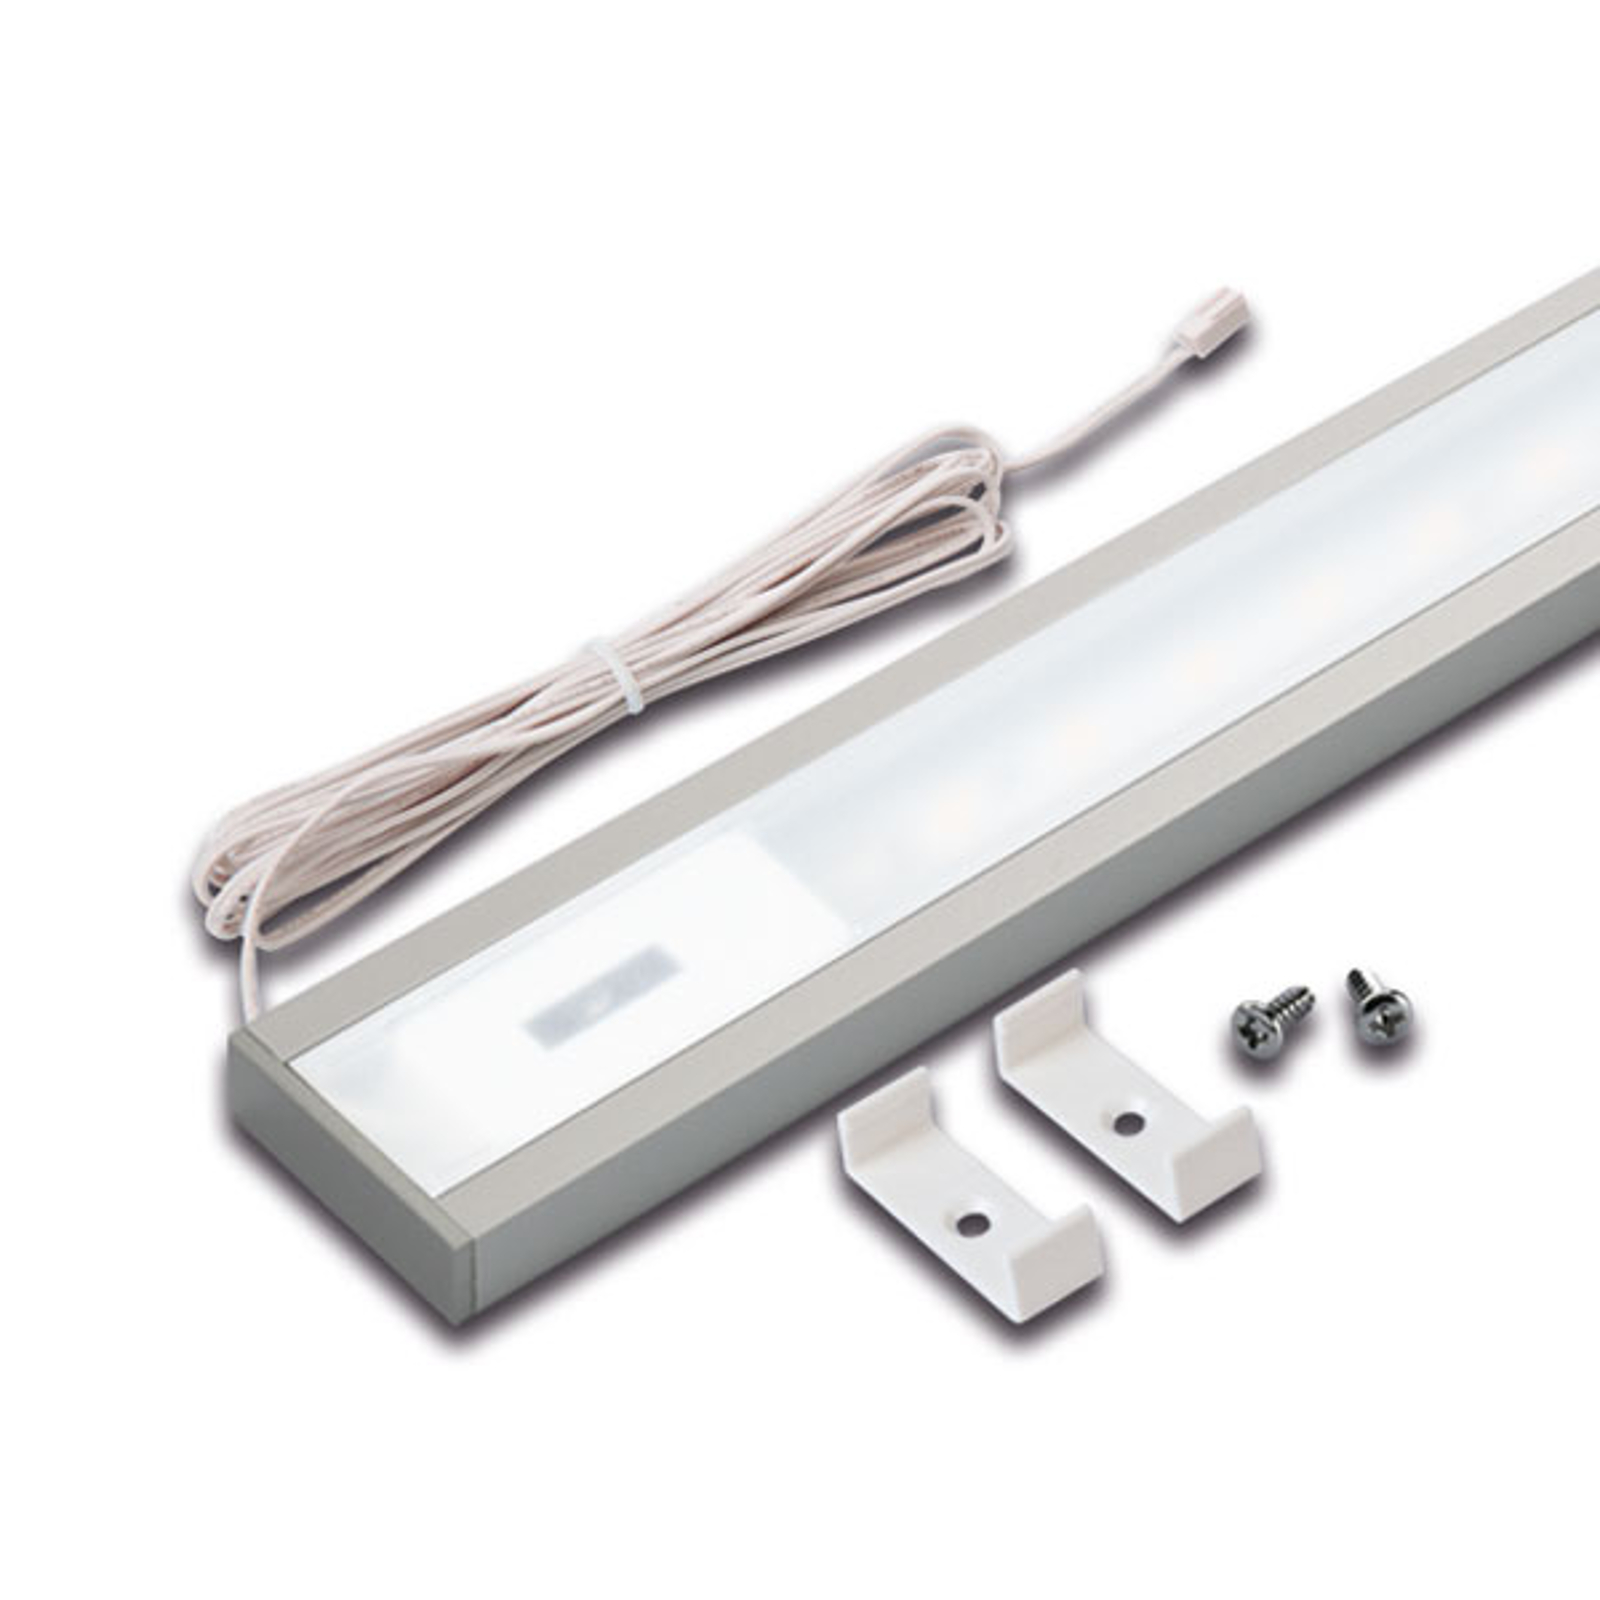 90cm long LED furniture light Top-Stick F_4514296_1